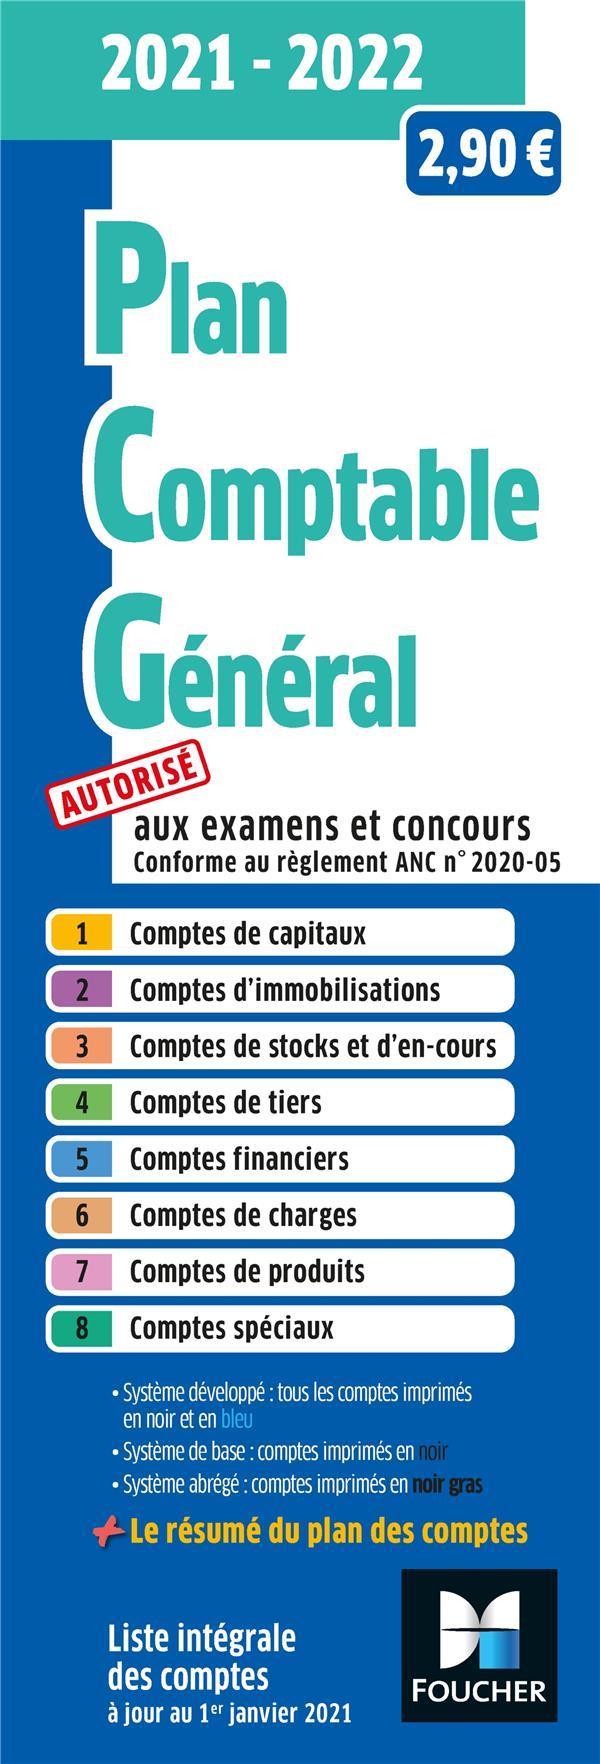 PLAN COMPTABLE GENERAL (EDITION 20212022)